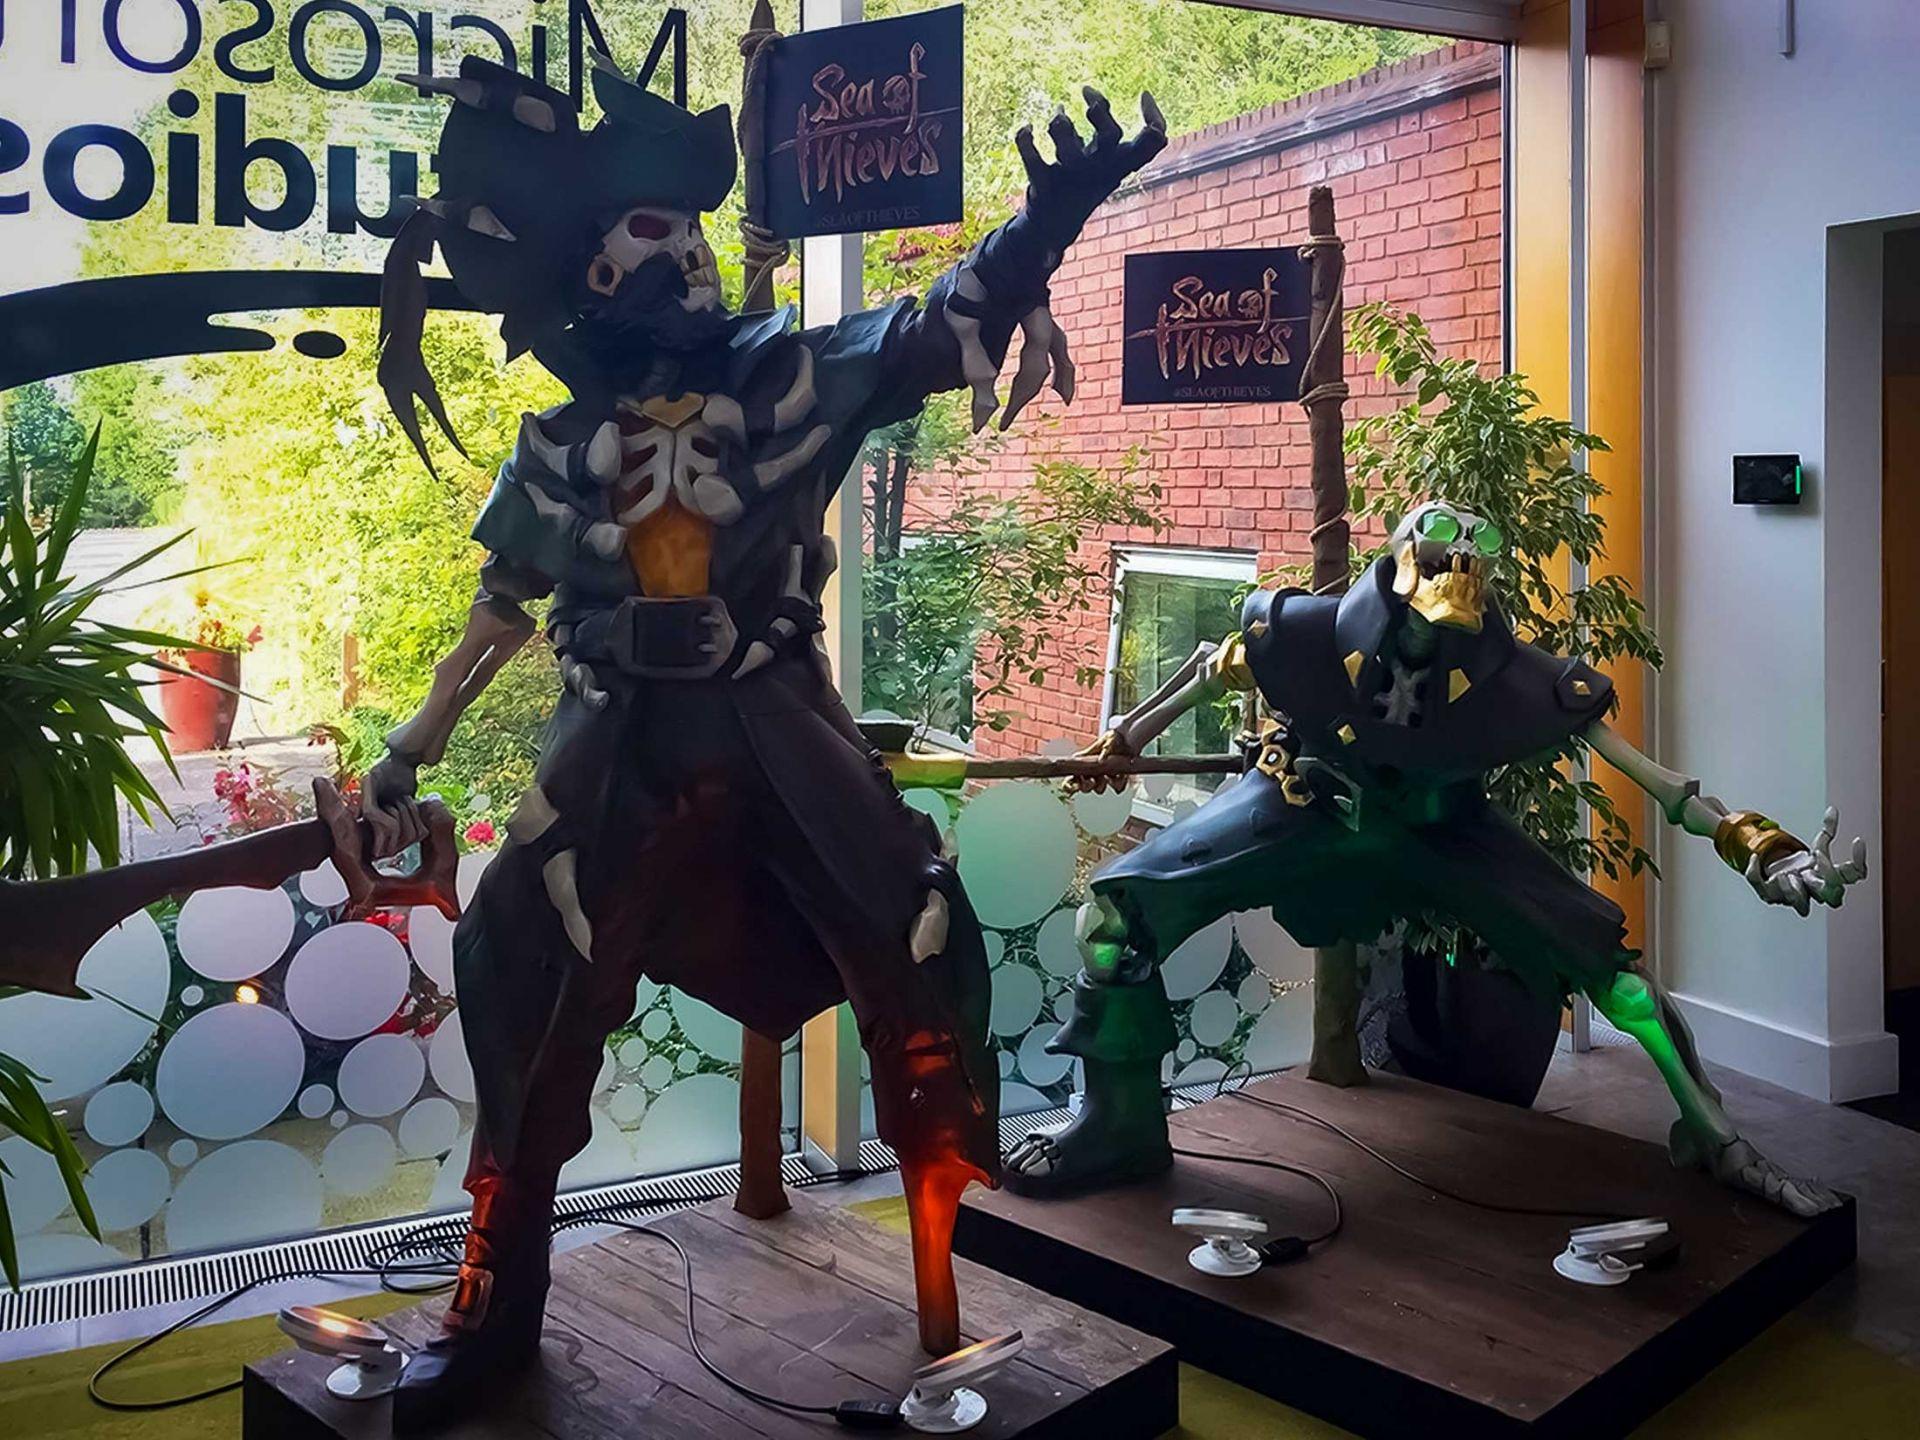 Sea of thieves character props on display at microsoft studios.